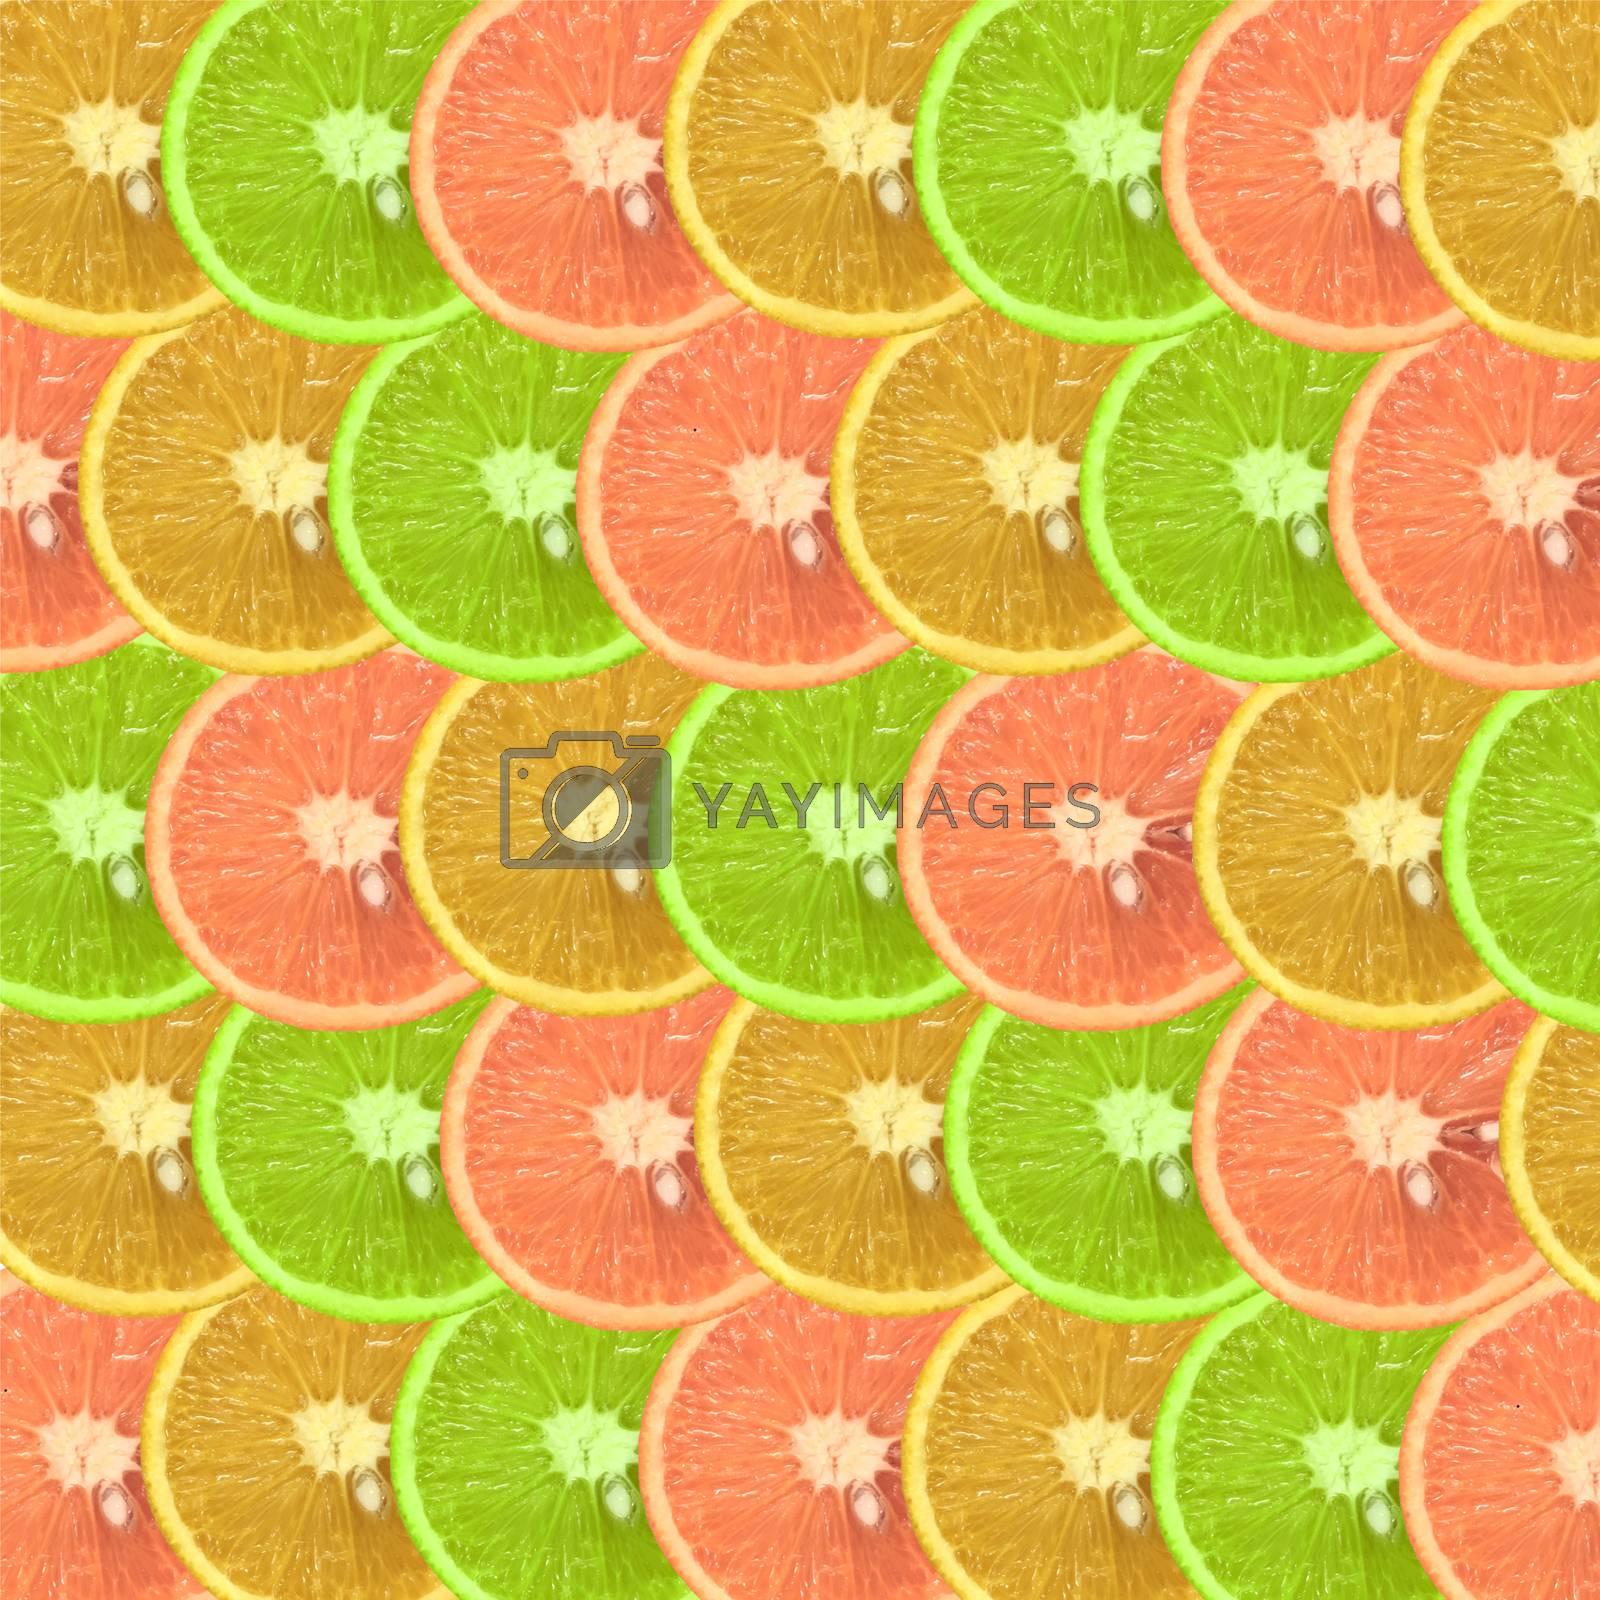 Fruit pattern of fresh orange slices.  by Margolana